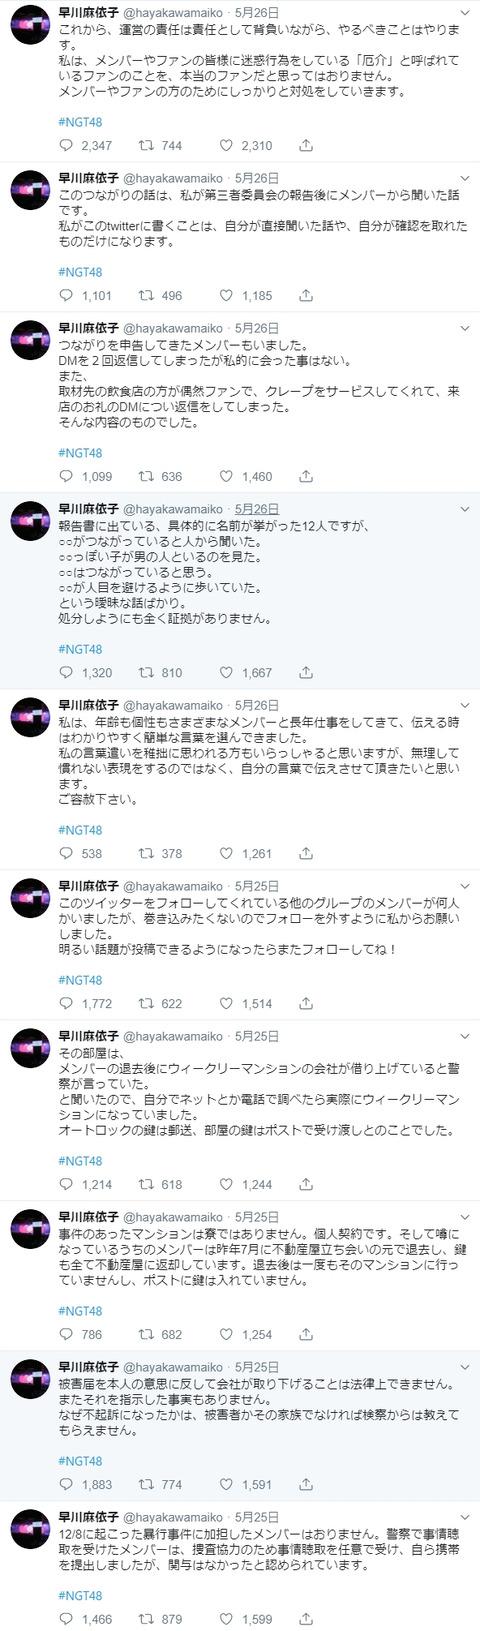 【NGT48】早川麻依子とかいう史上最低の支配人はどう責任を取るのか?